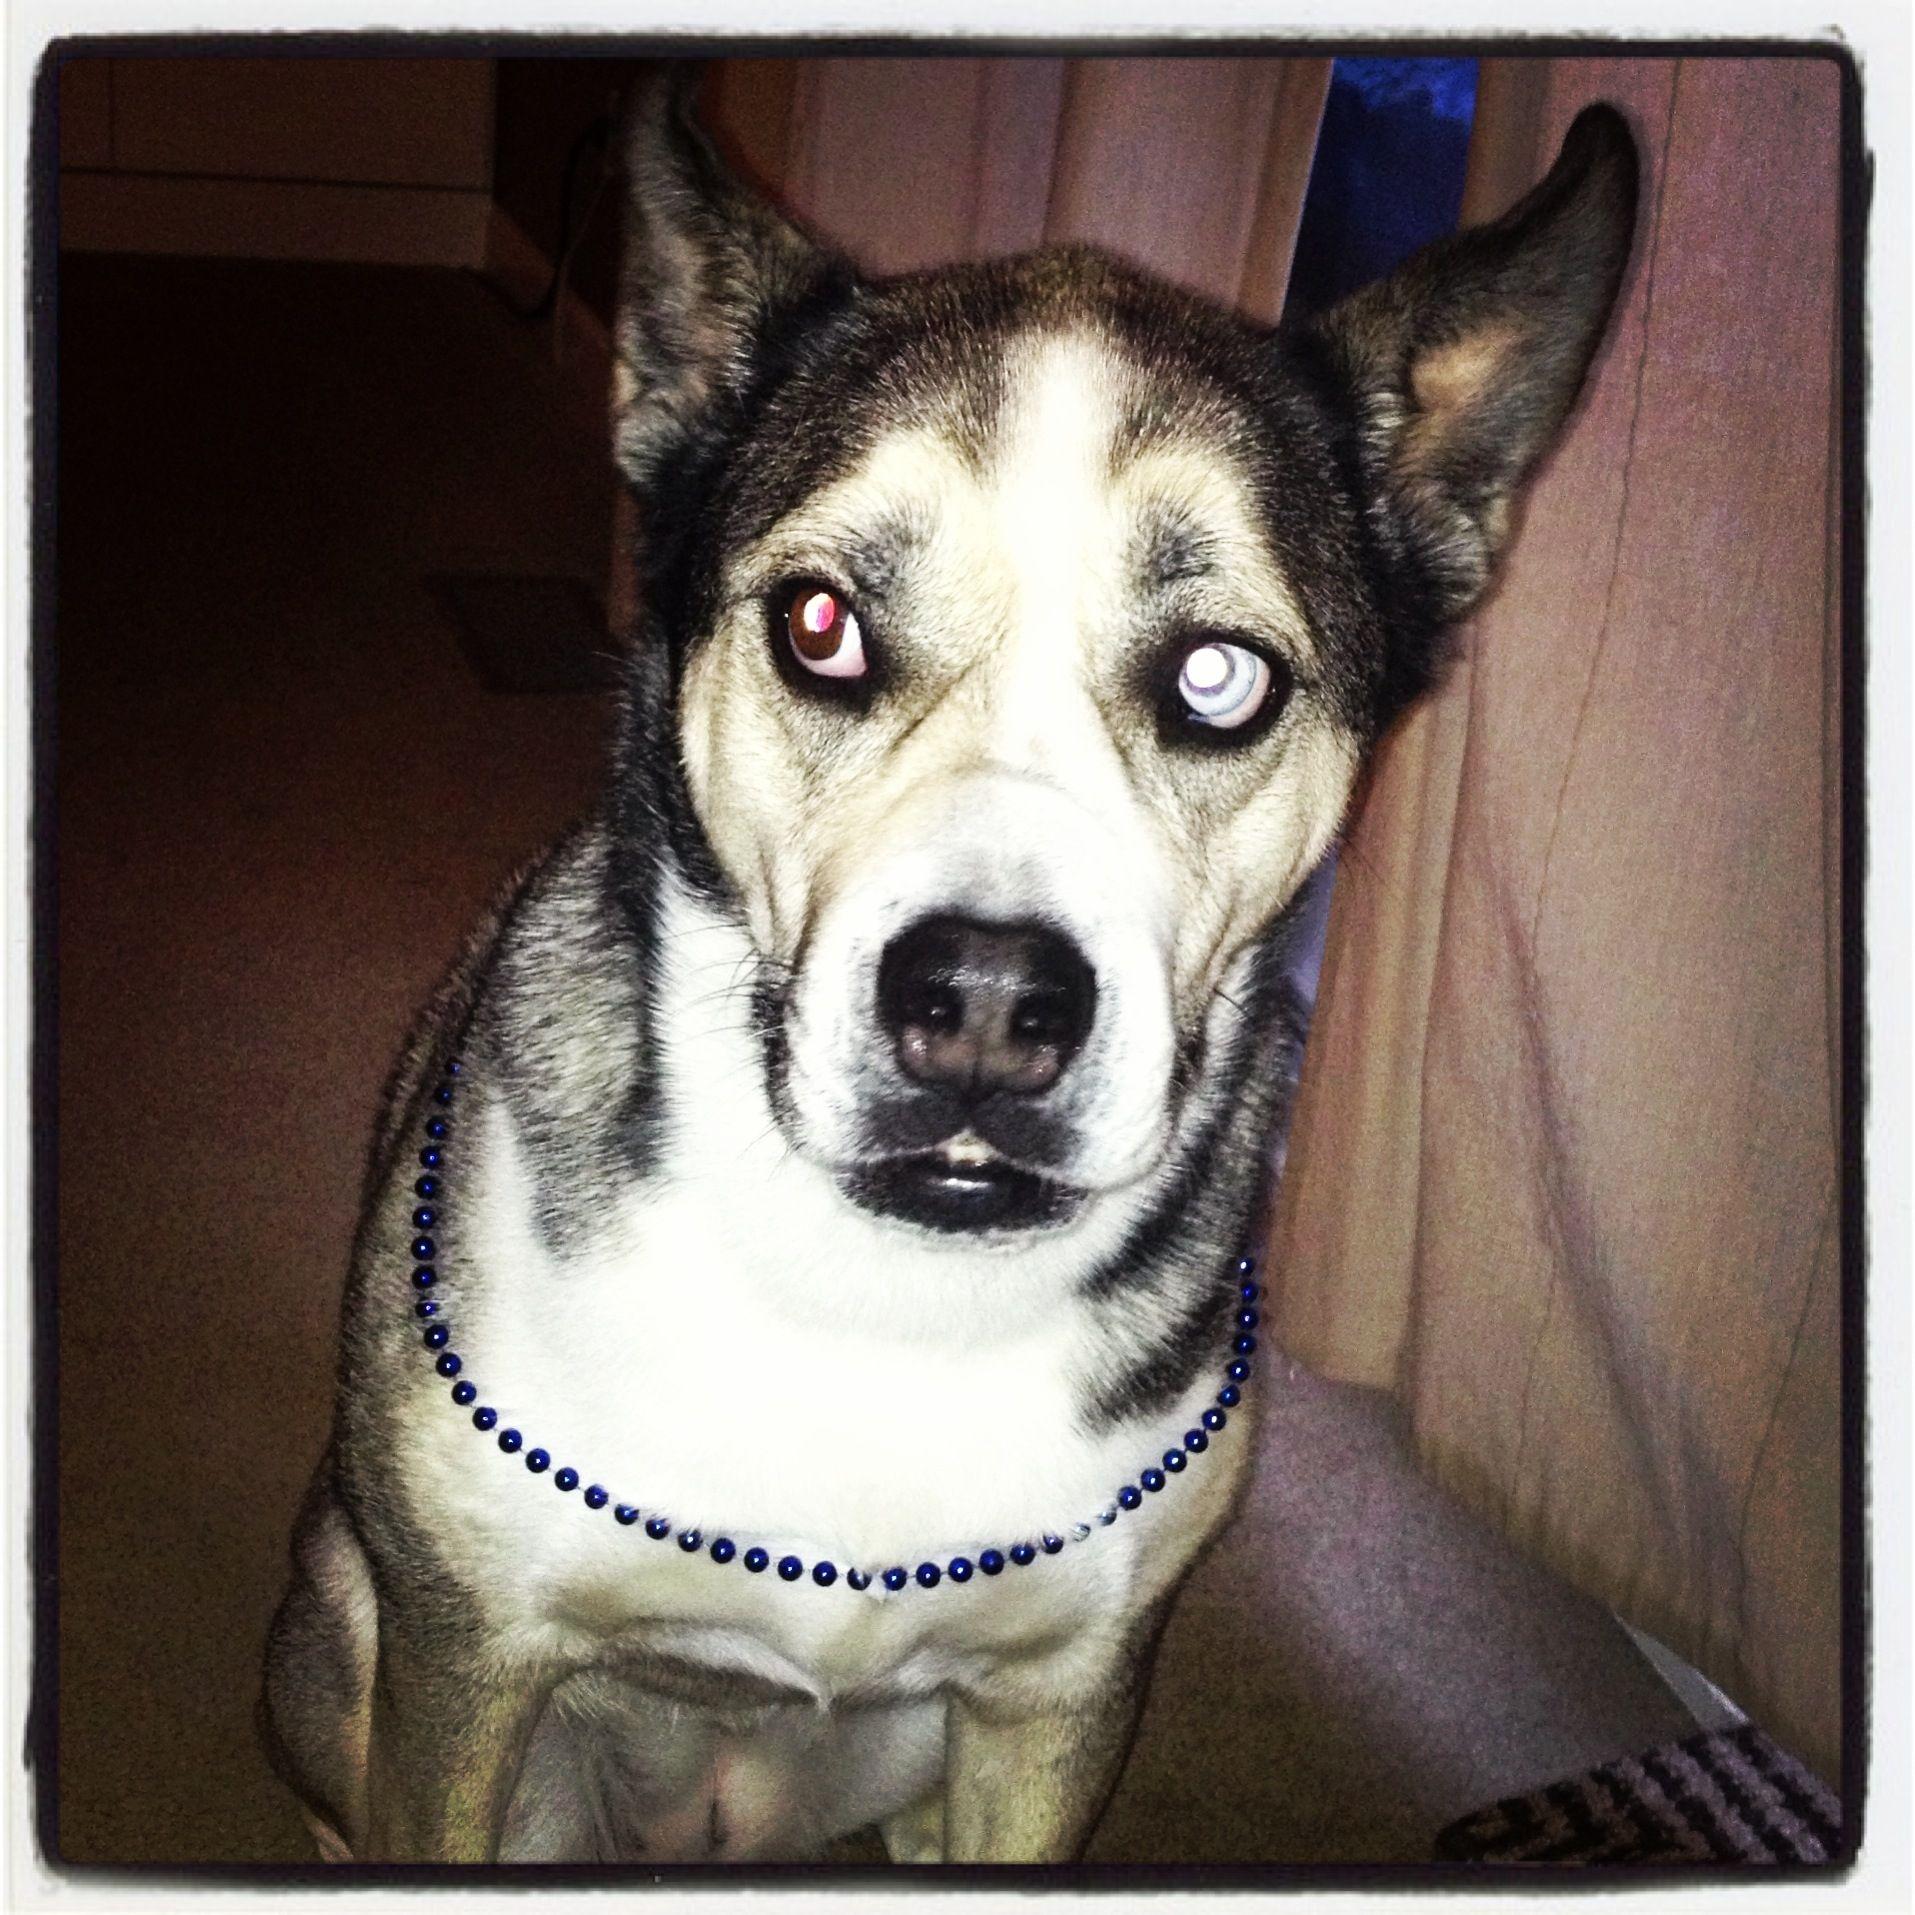 Laddie The Wonder Dog Siberian Husky English Bulldog Mix English Bulldog Siberian Husky Husky